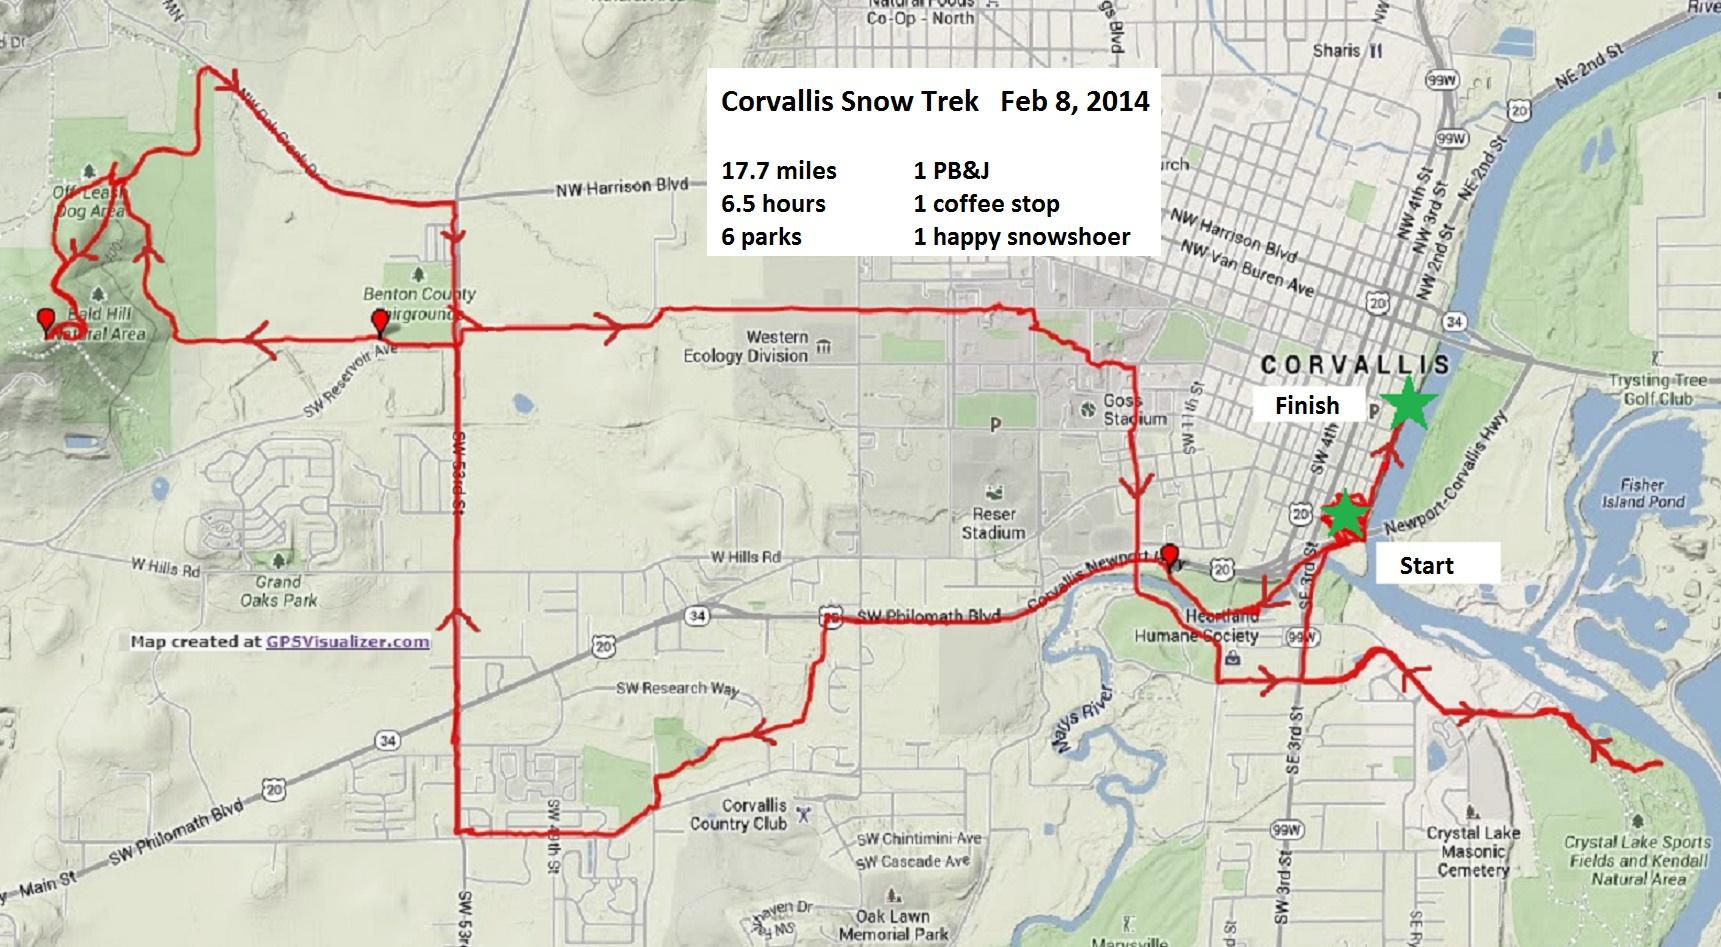 Corvallis Snow Trek Jessborg